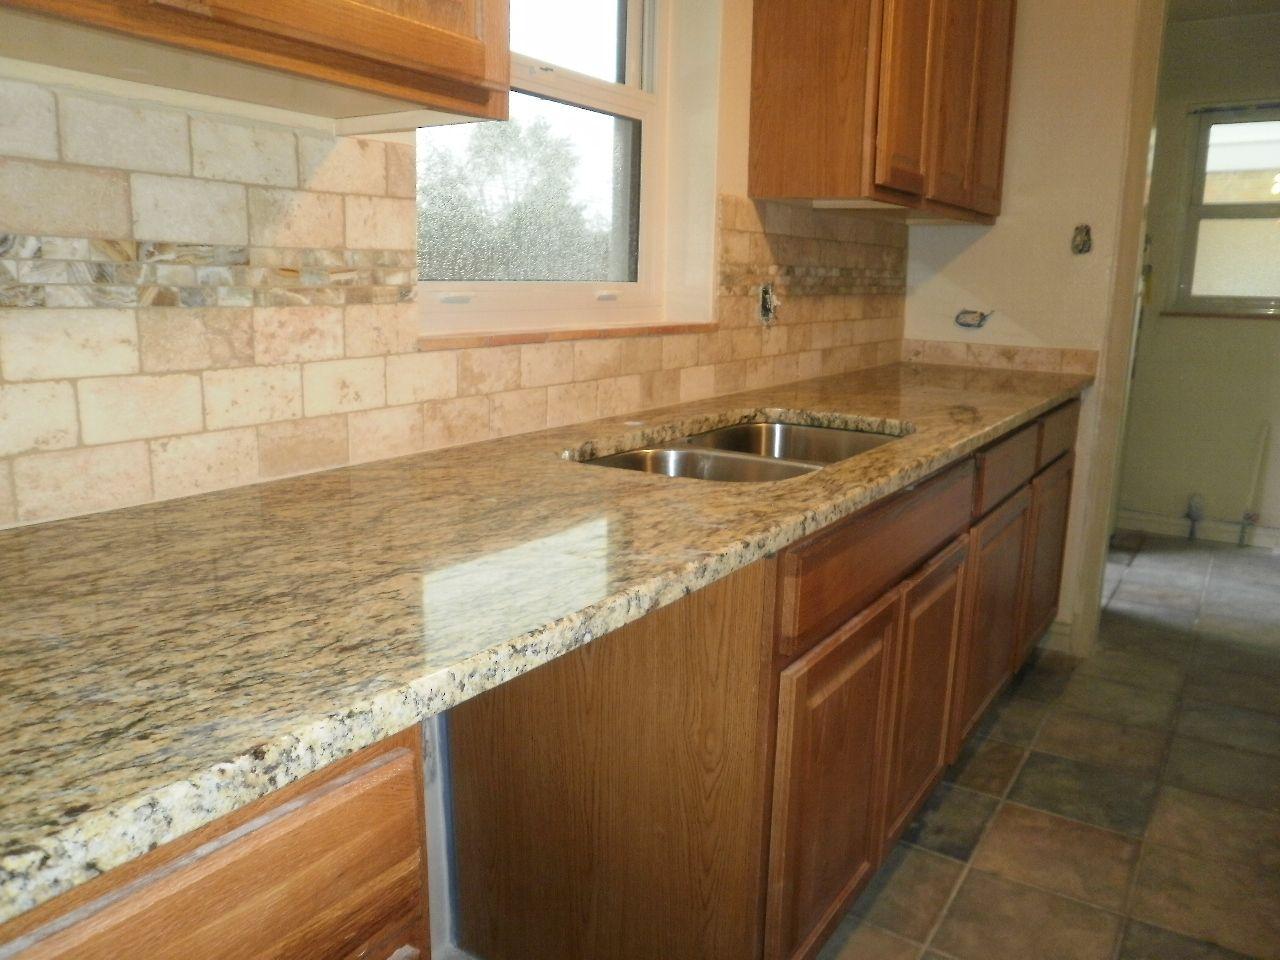 Tile Backsplash Granite Countertop Oak Colored Cupboards